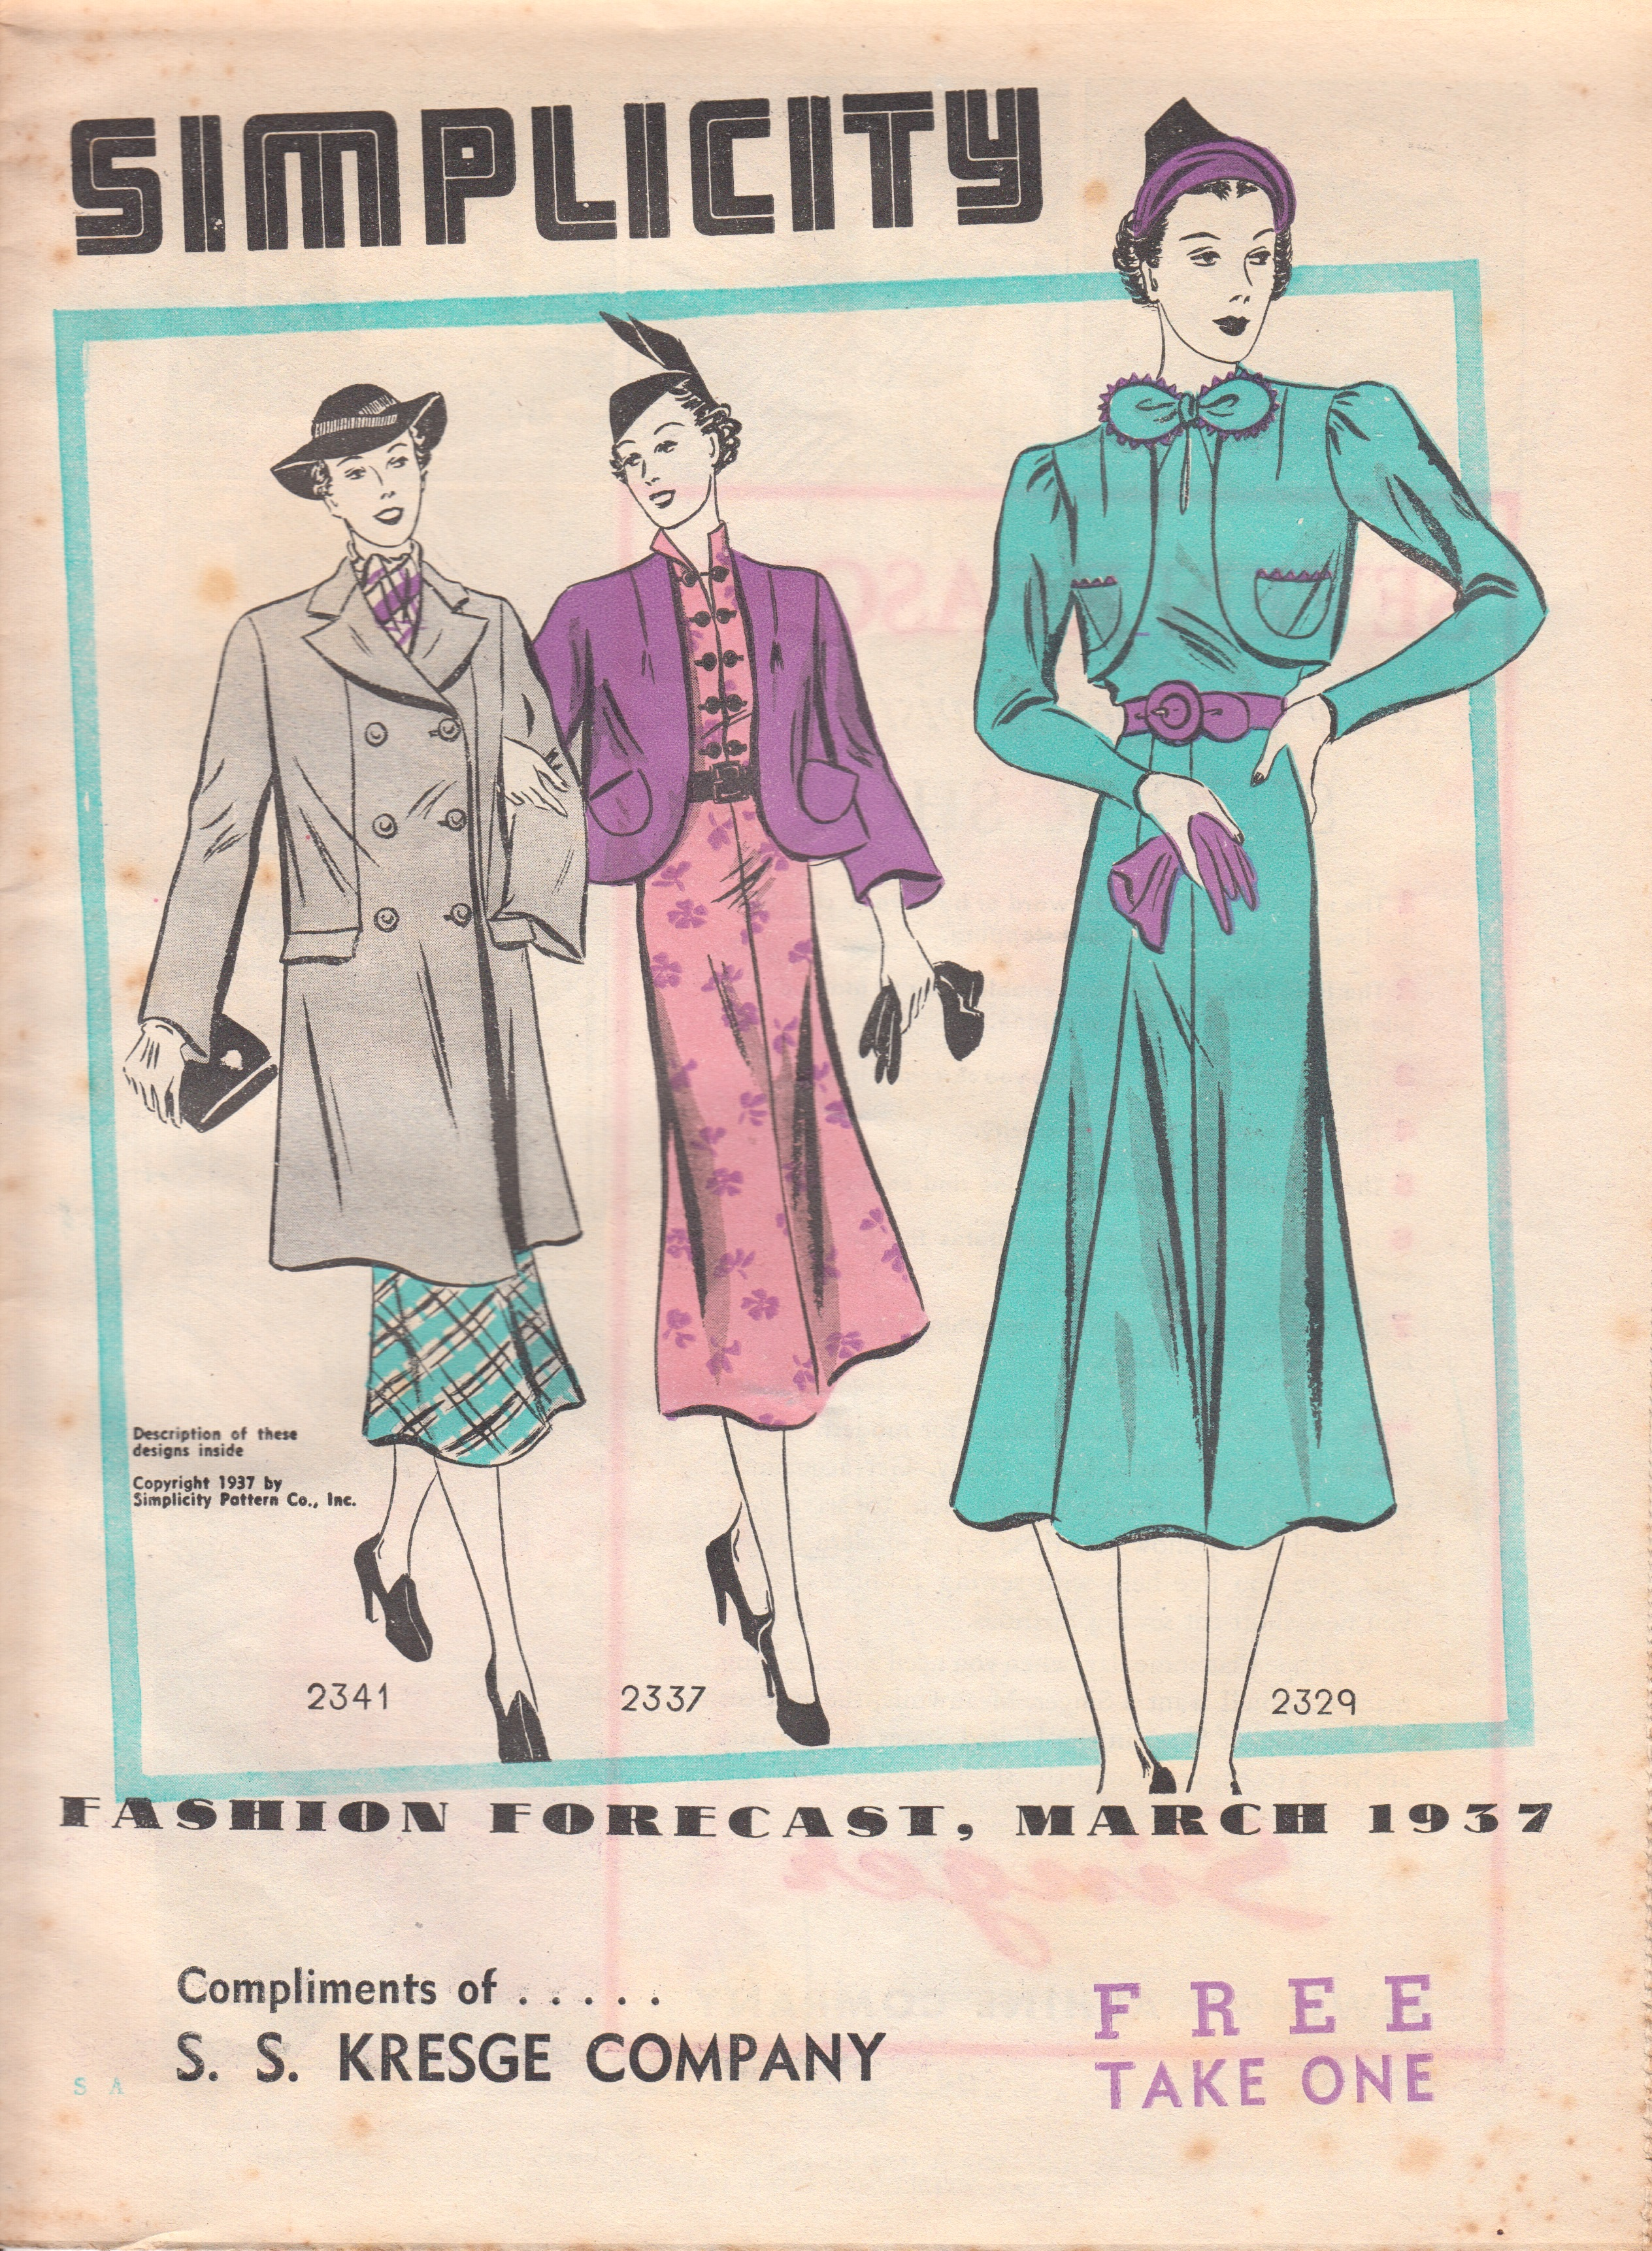 Simplicity Fashion Forecast March 1937